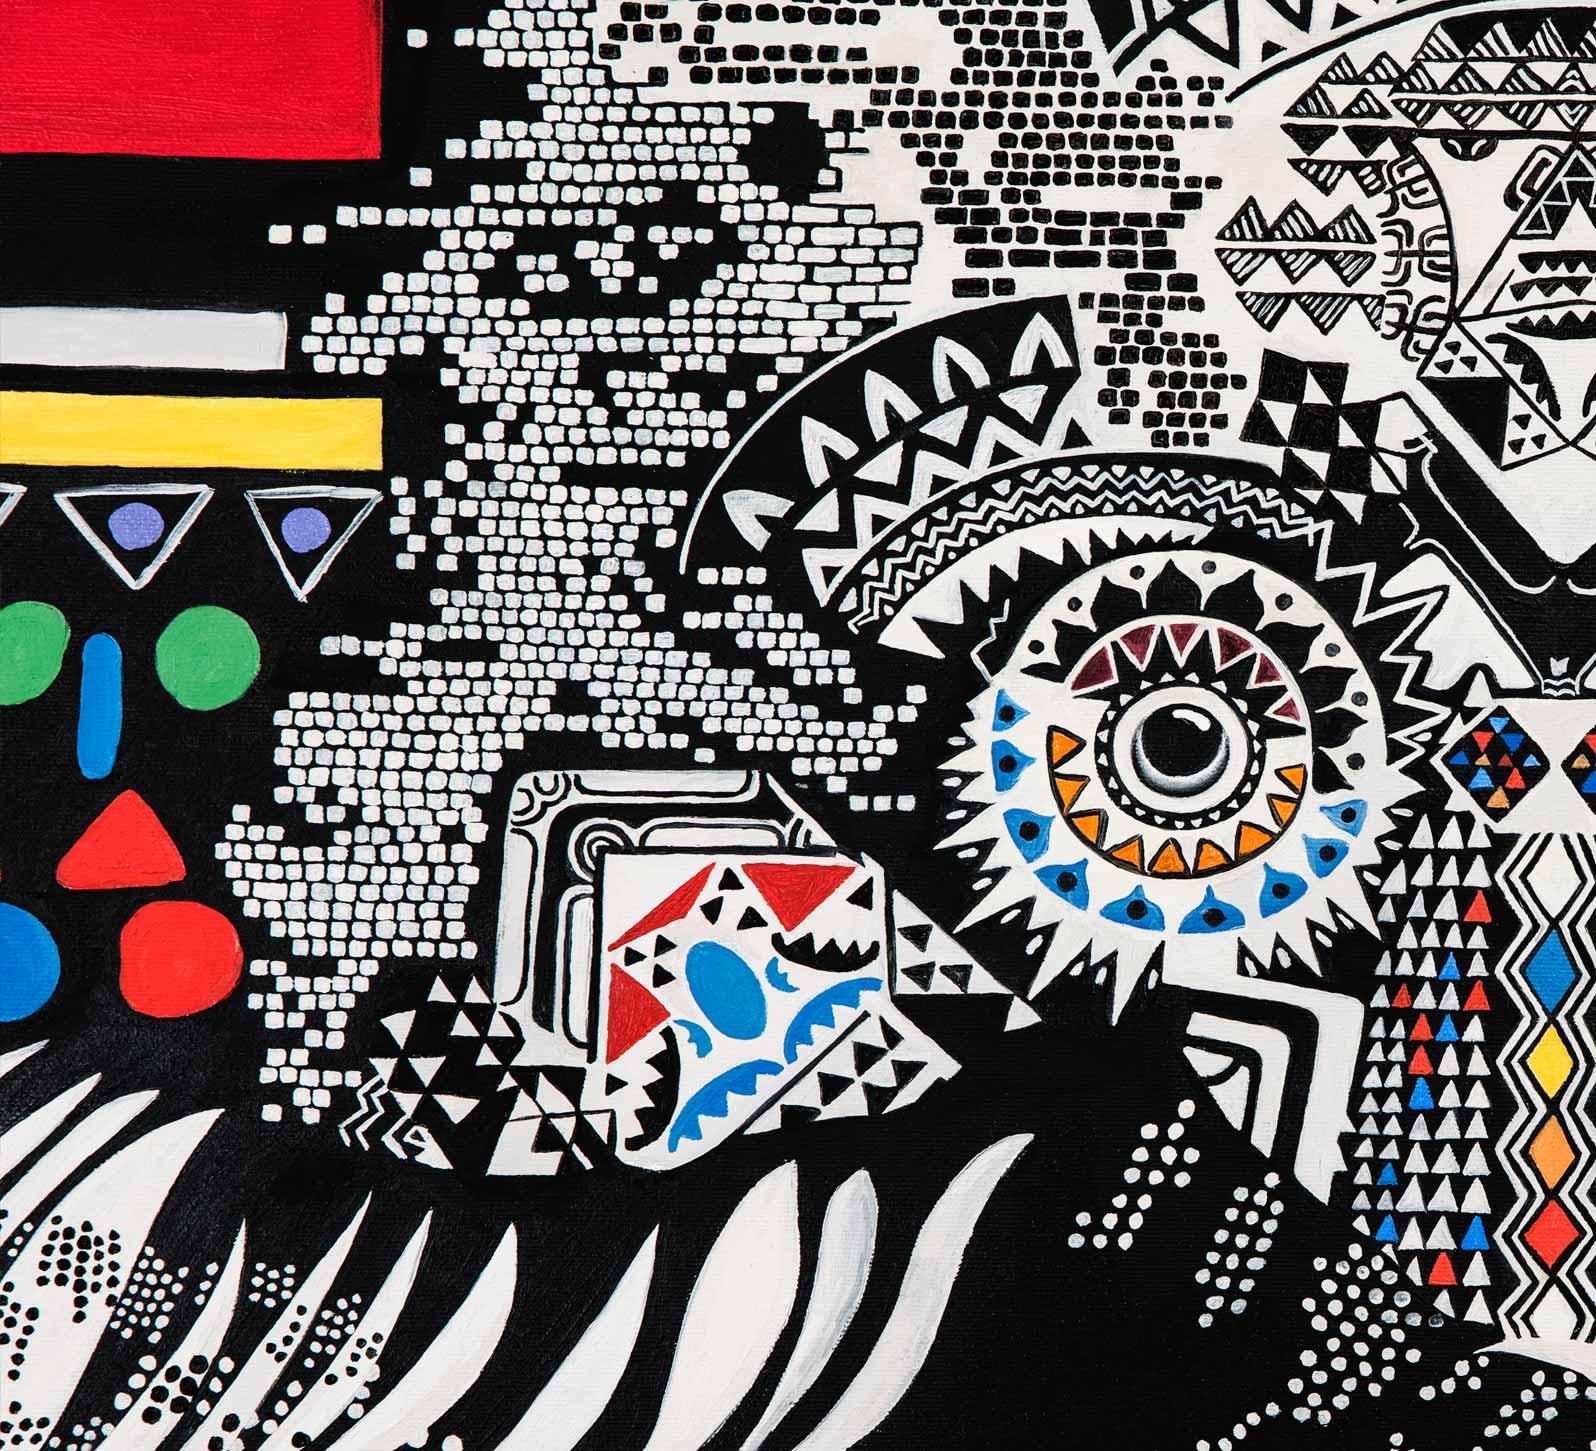 Anca Stefanescu | Contemporary Creative Painter, Pathfinder